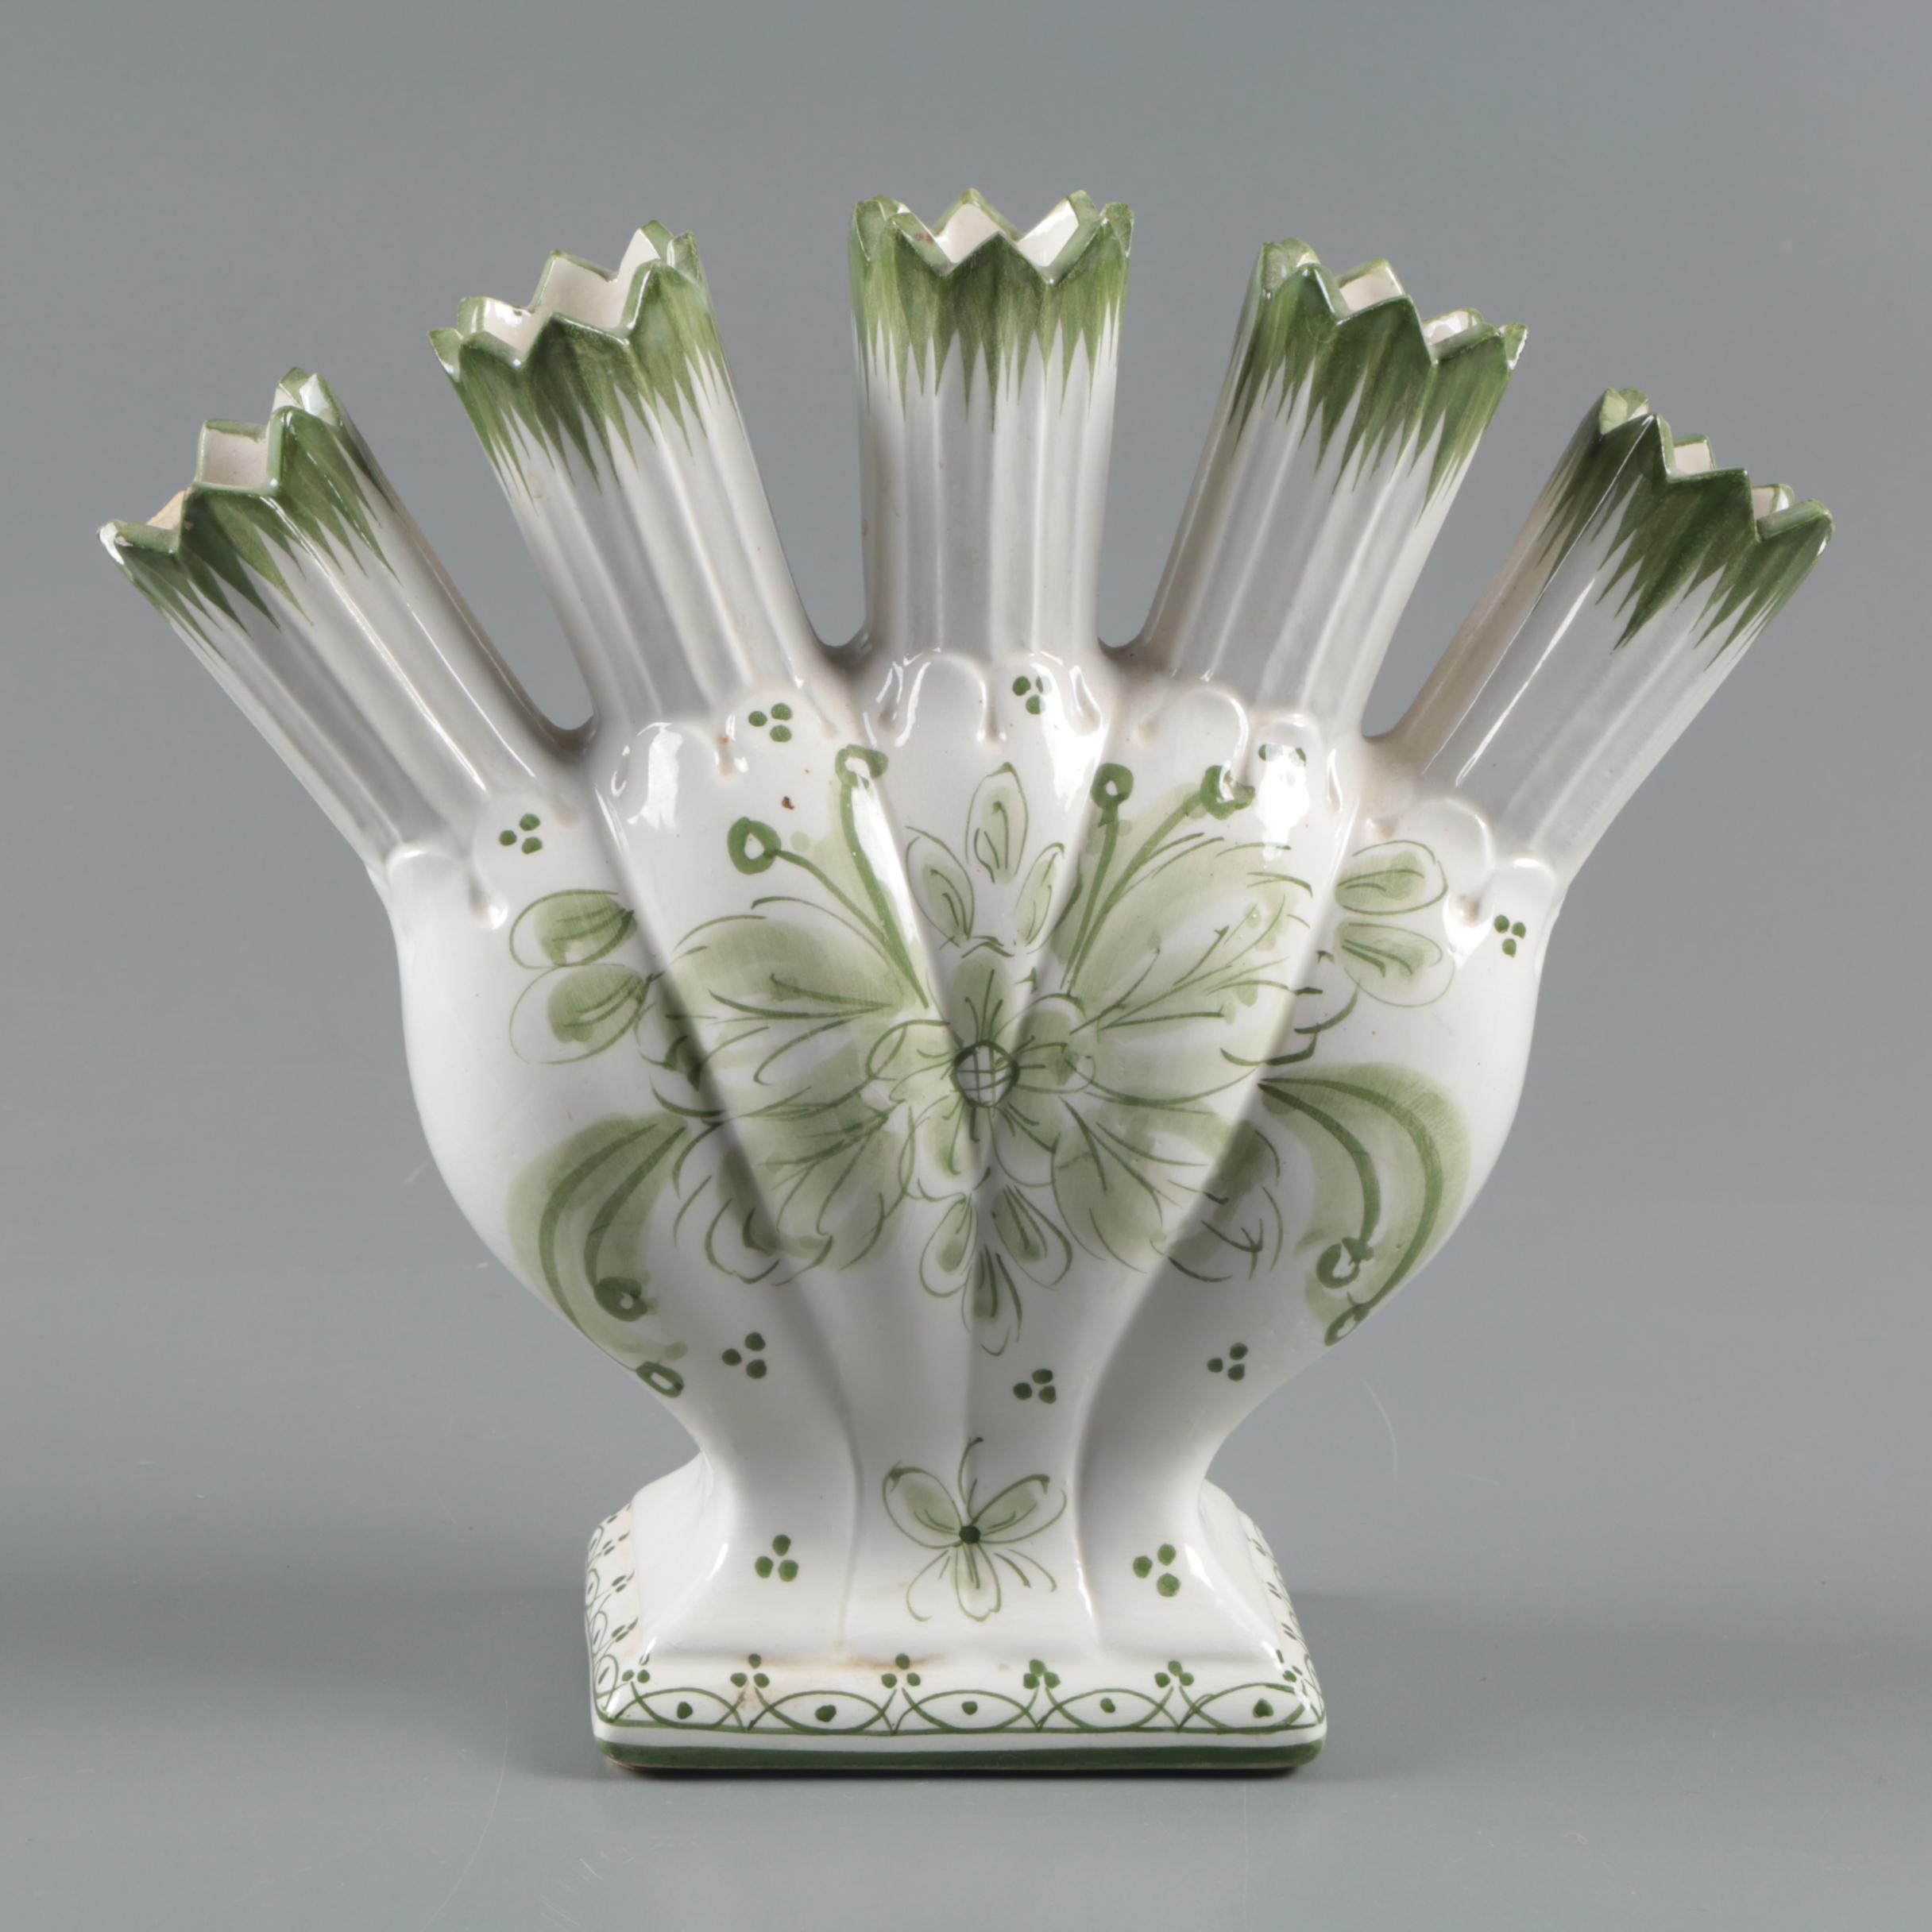 Hand-Painted Ceramic Five Finger Tulipiere